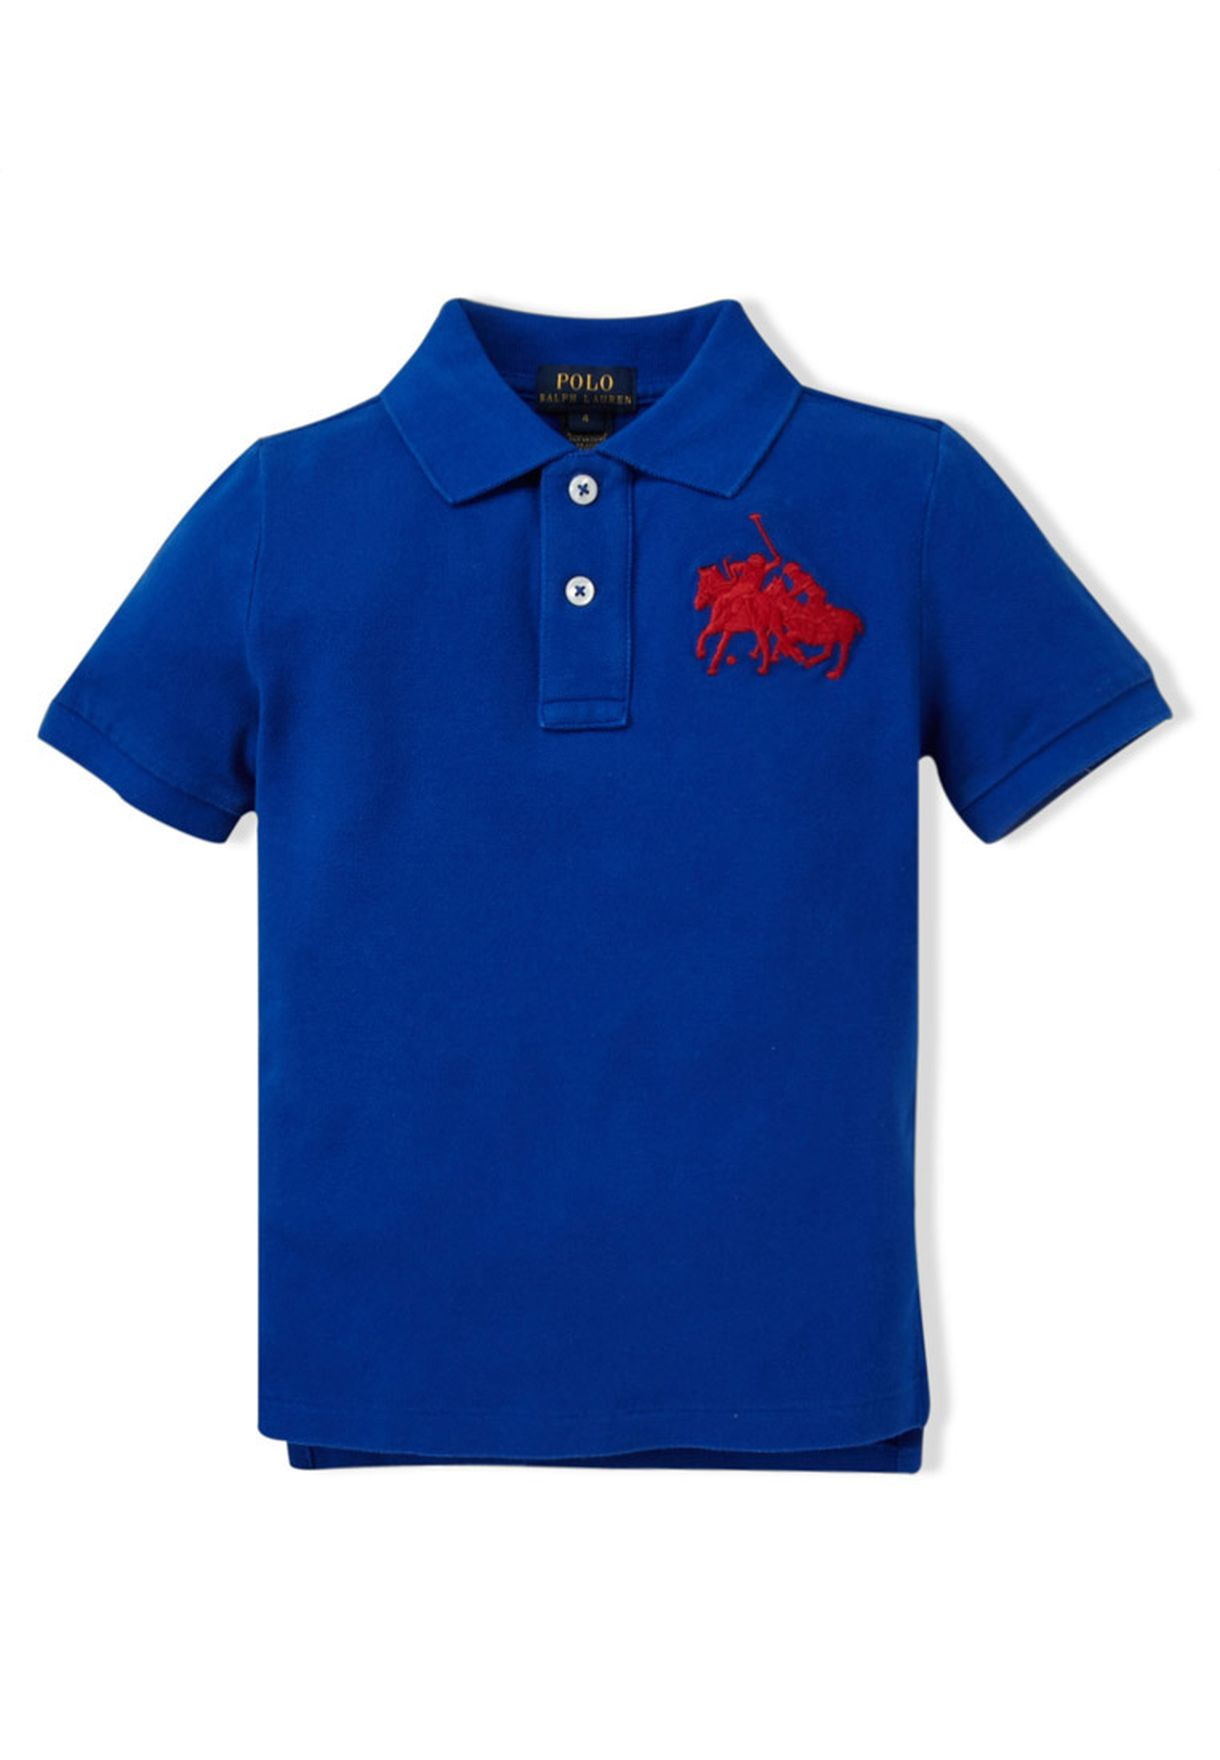 d4192590f Shop Polo Ralph Lauren blue Logo T-Shirt for Kids in Oman - RA777AT58XSV